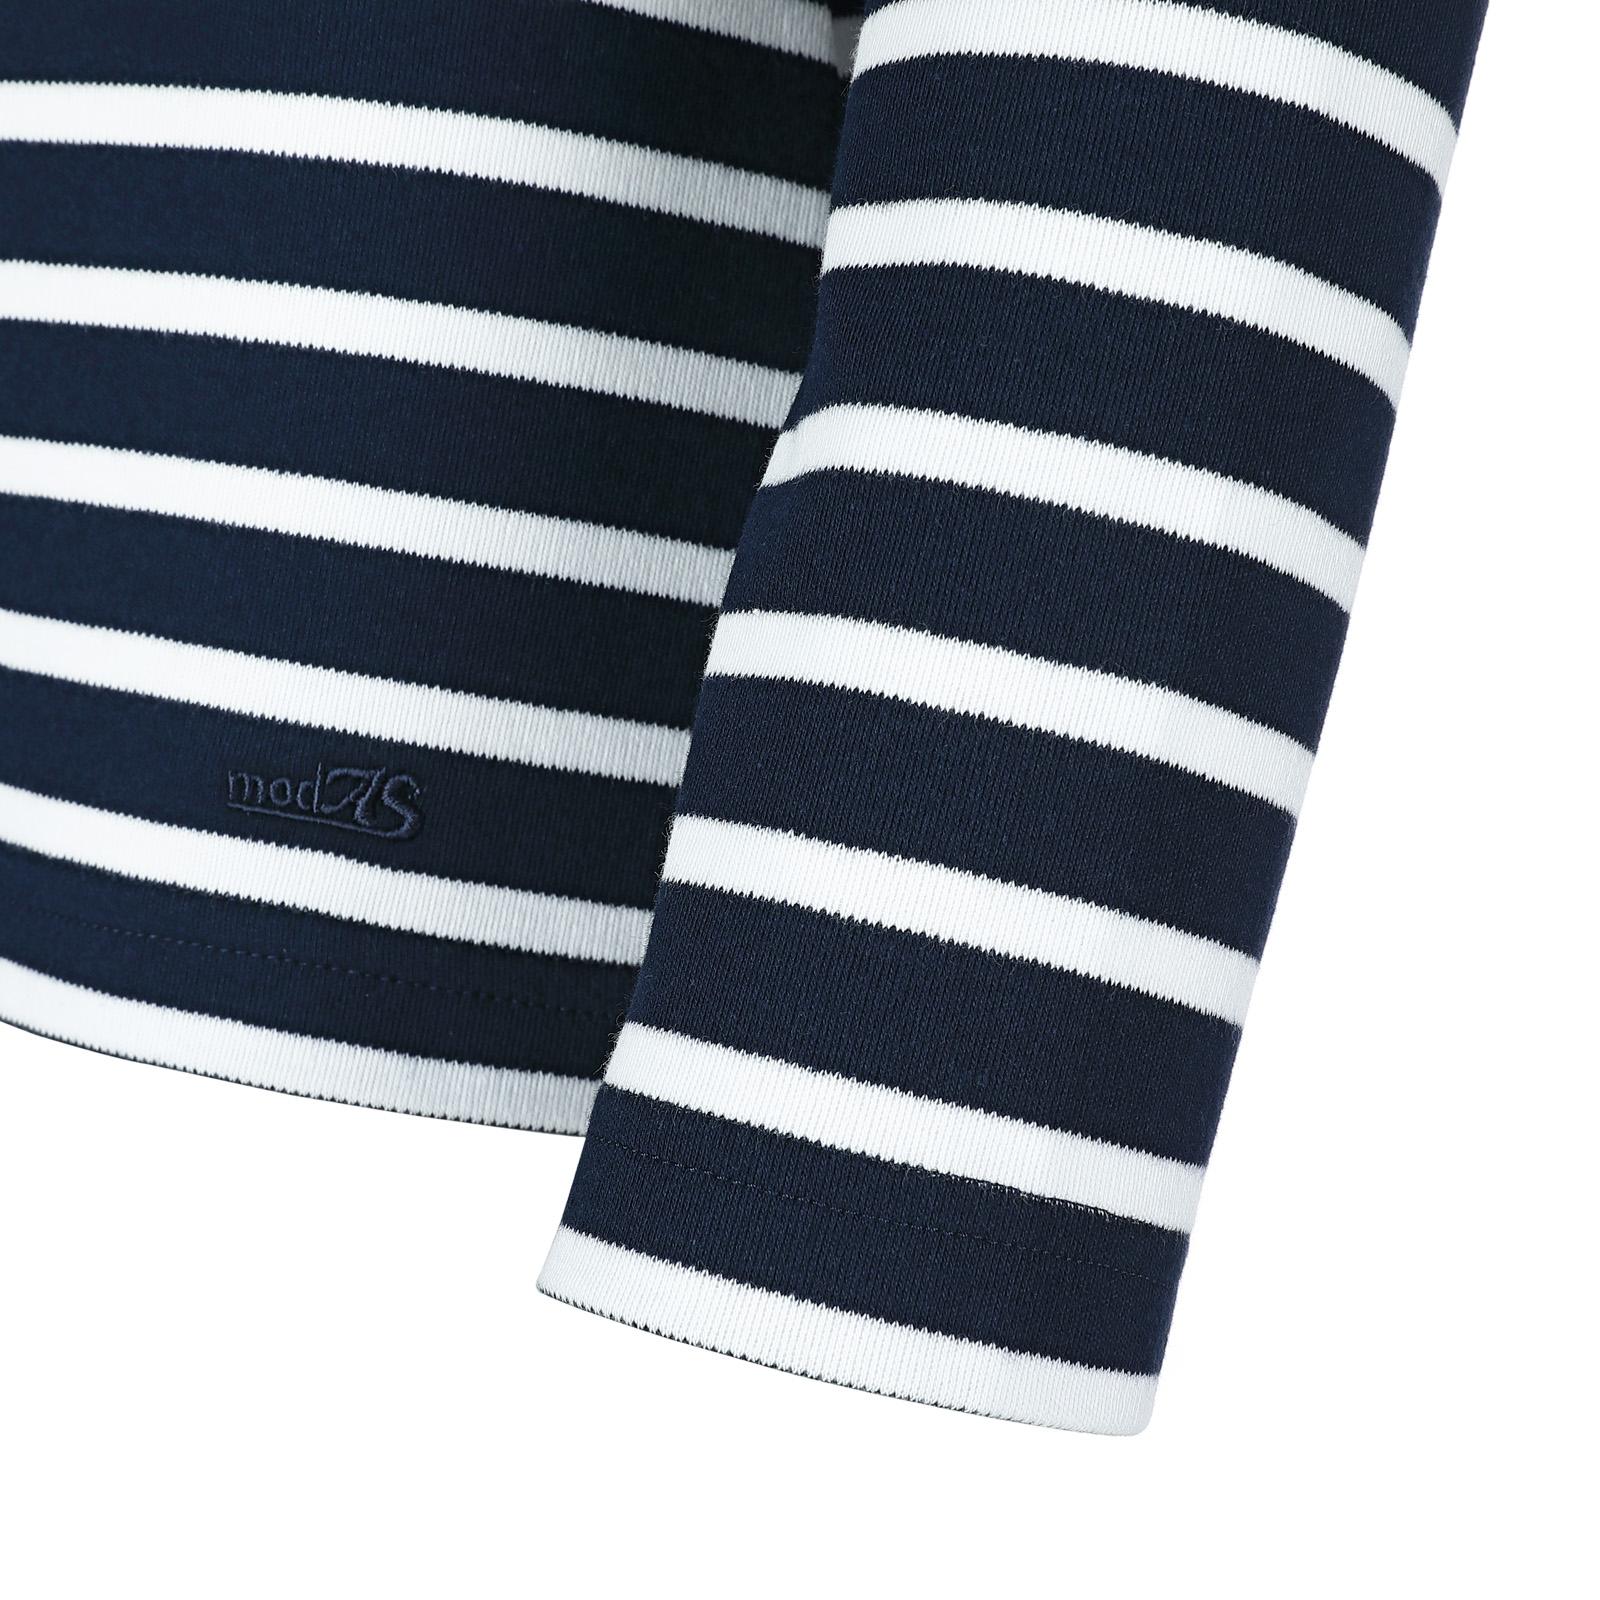 Maritimes Damen-Shirt 1/1-Arm weiß/grau-melange